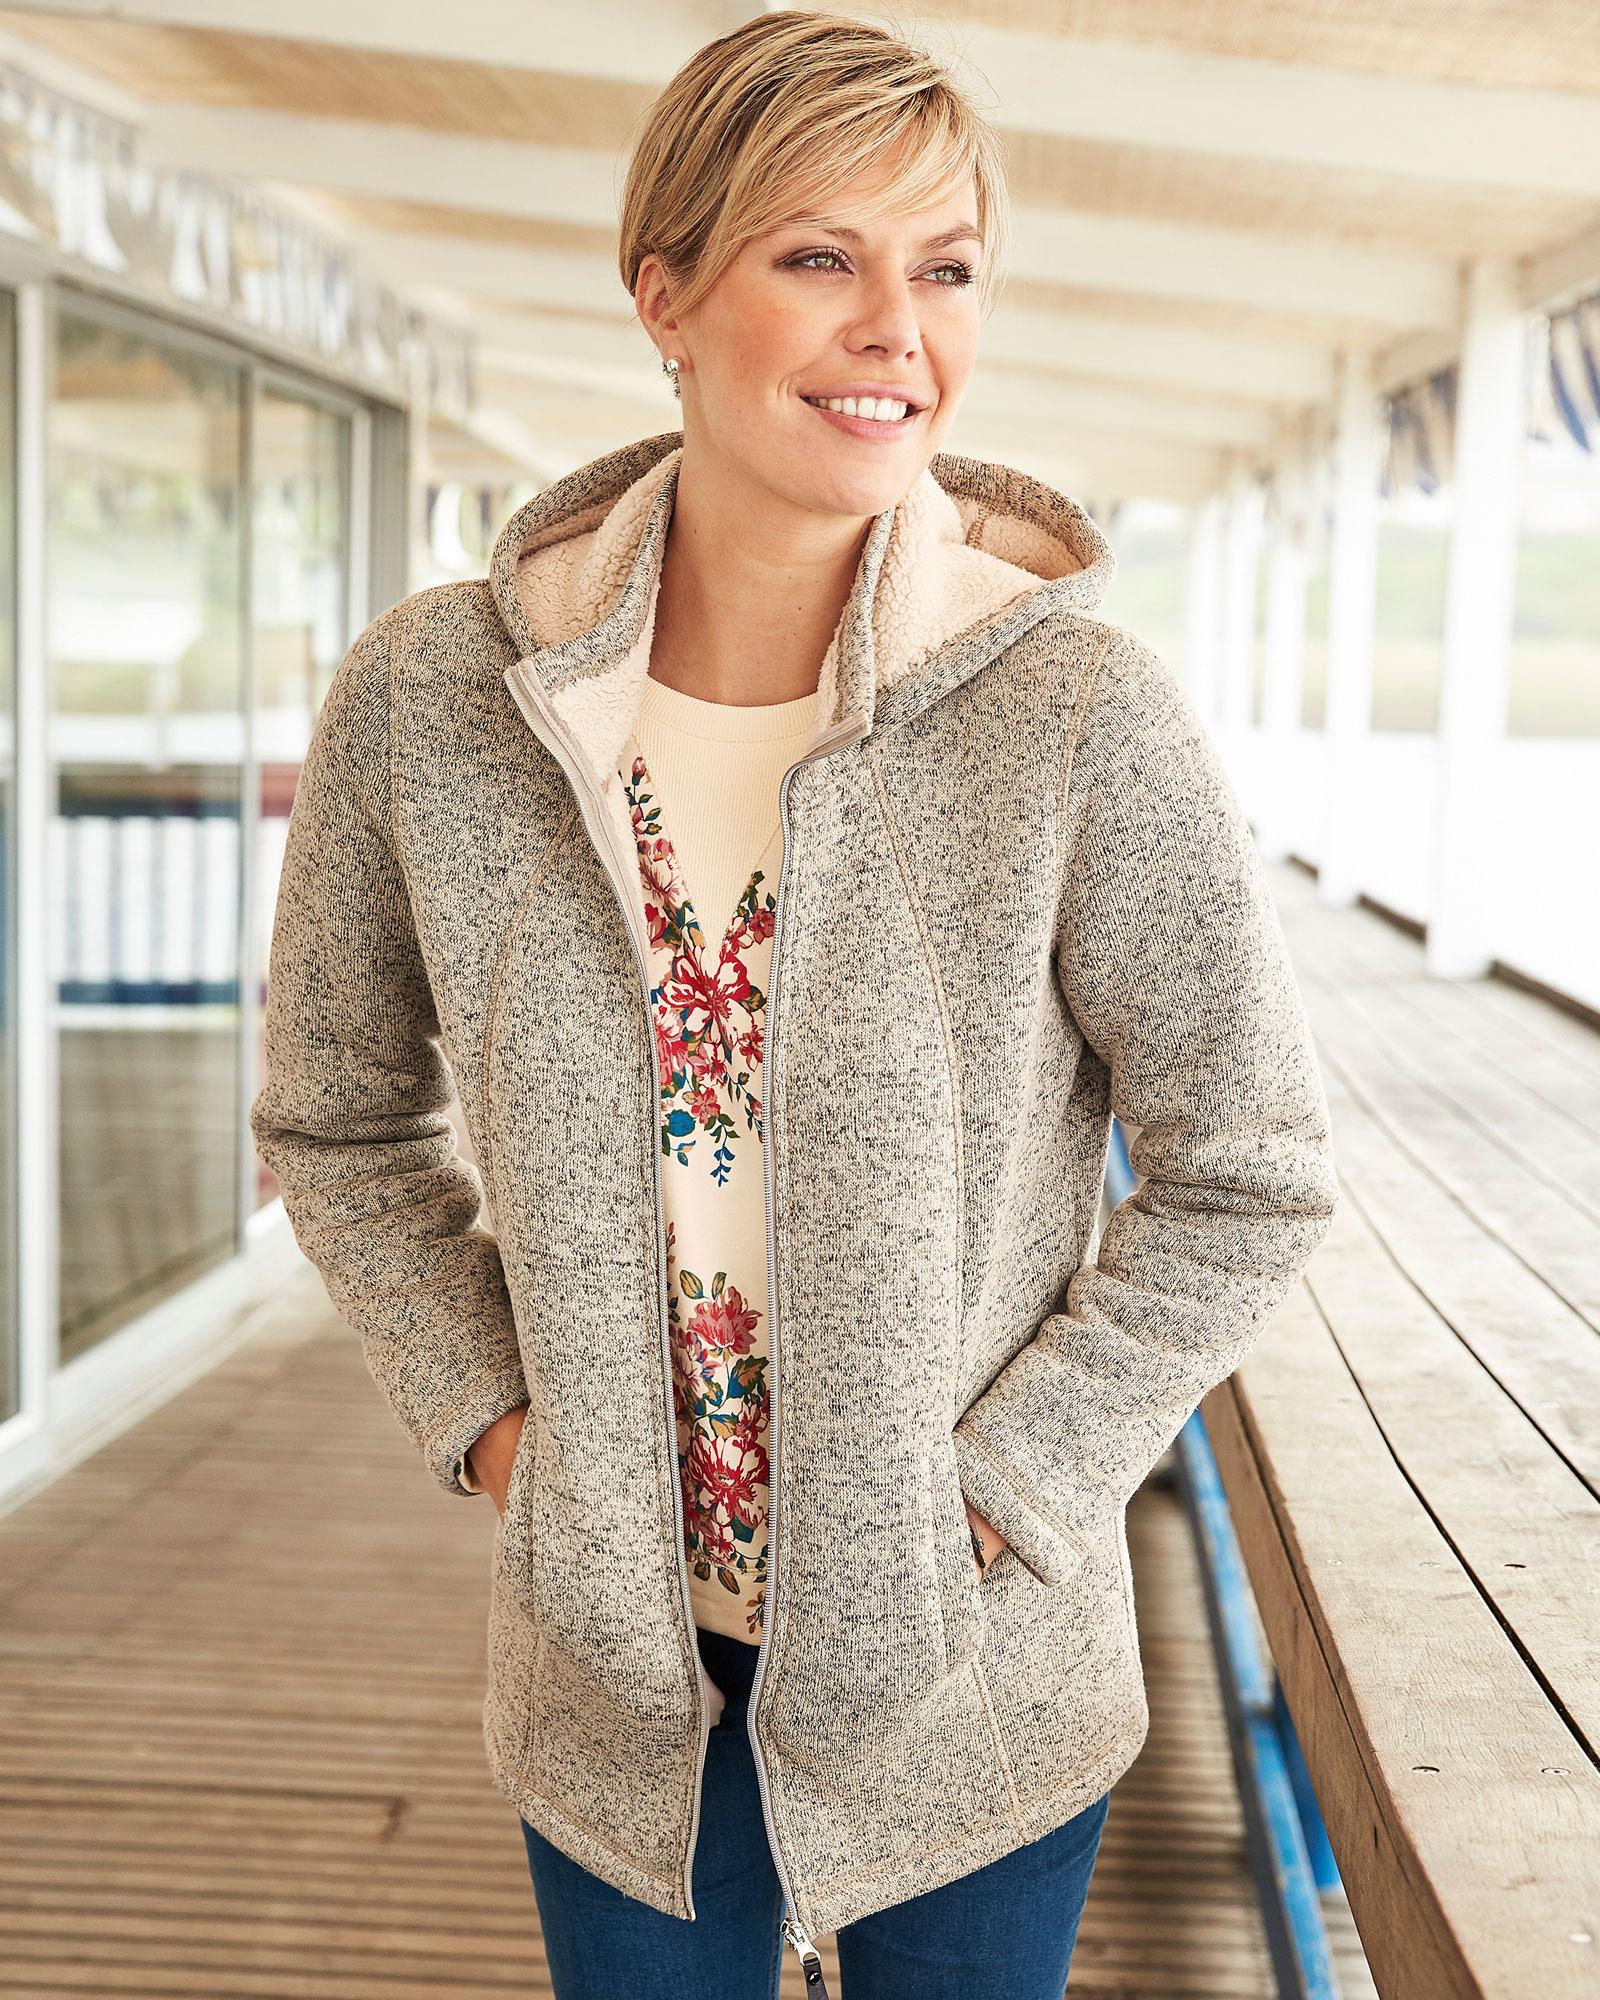 Cotton Traders Womens Bonded Fleece Jacket